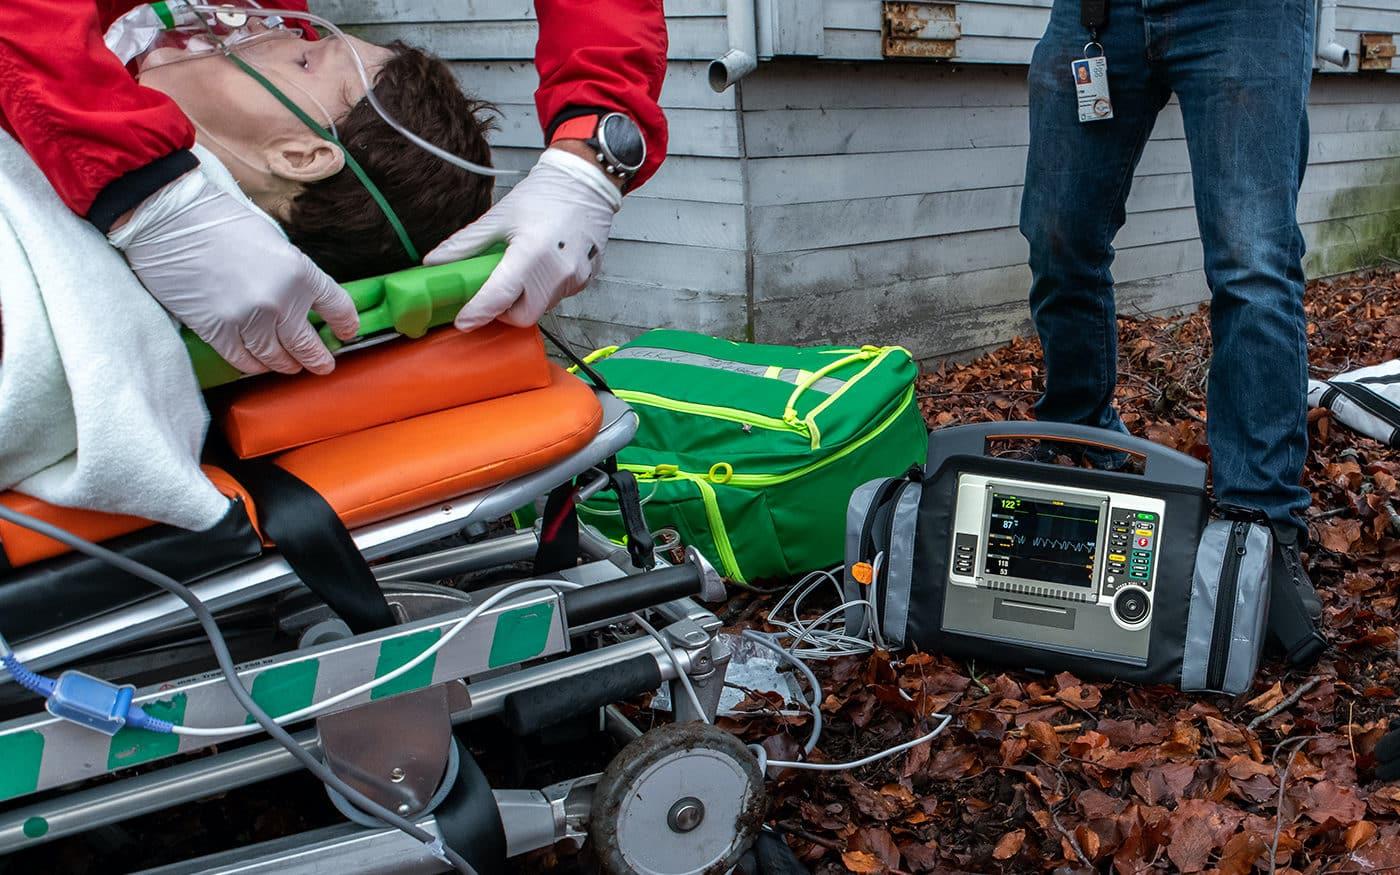 Oslo University Hospital uses qube15 Simulator from SKILLQUBE